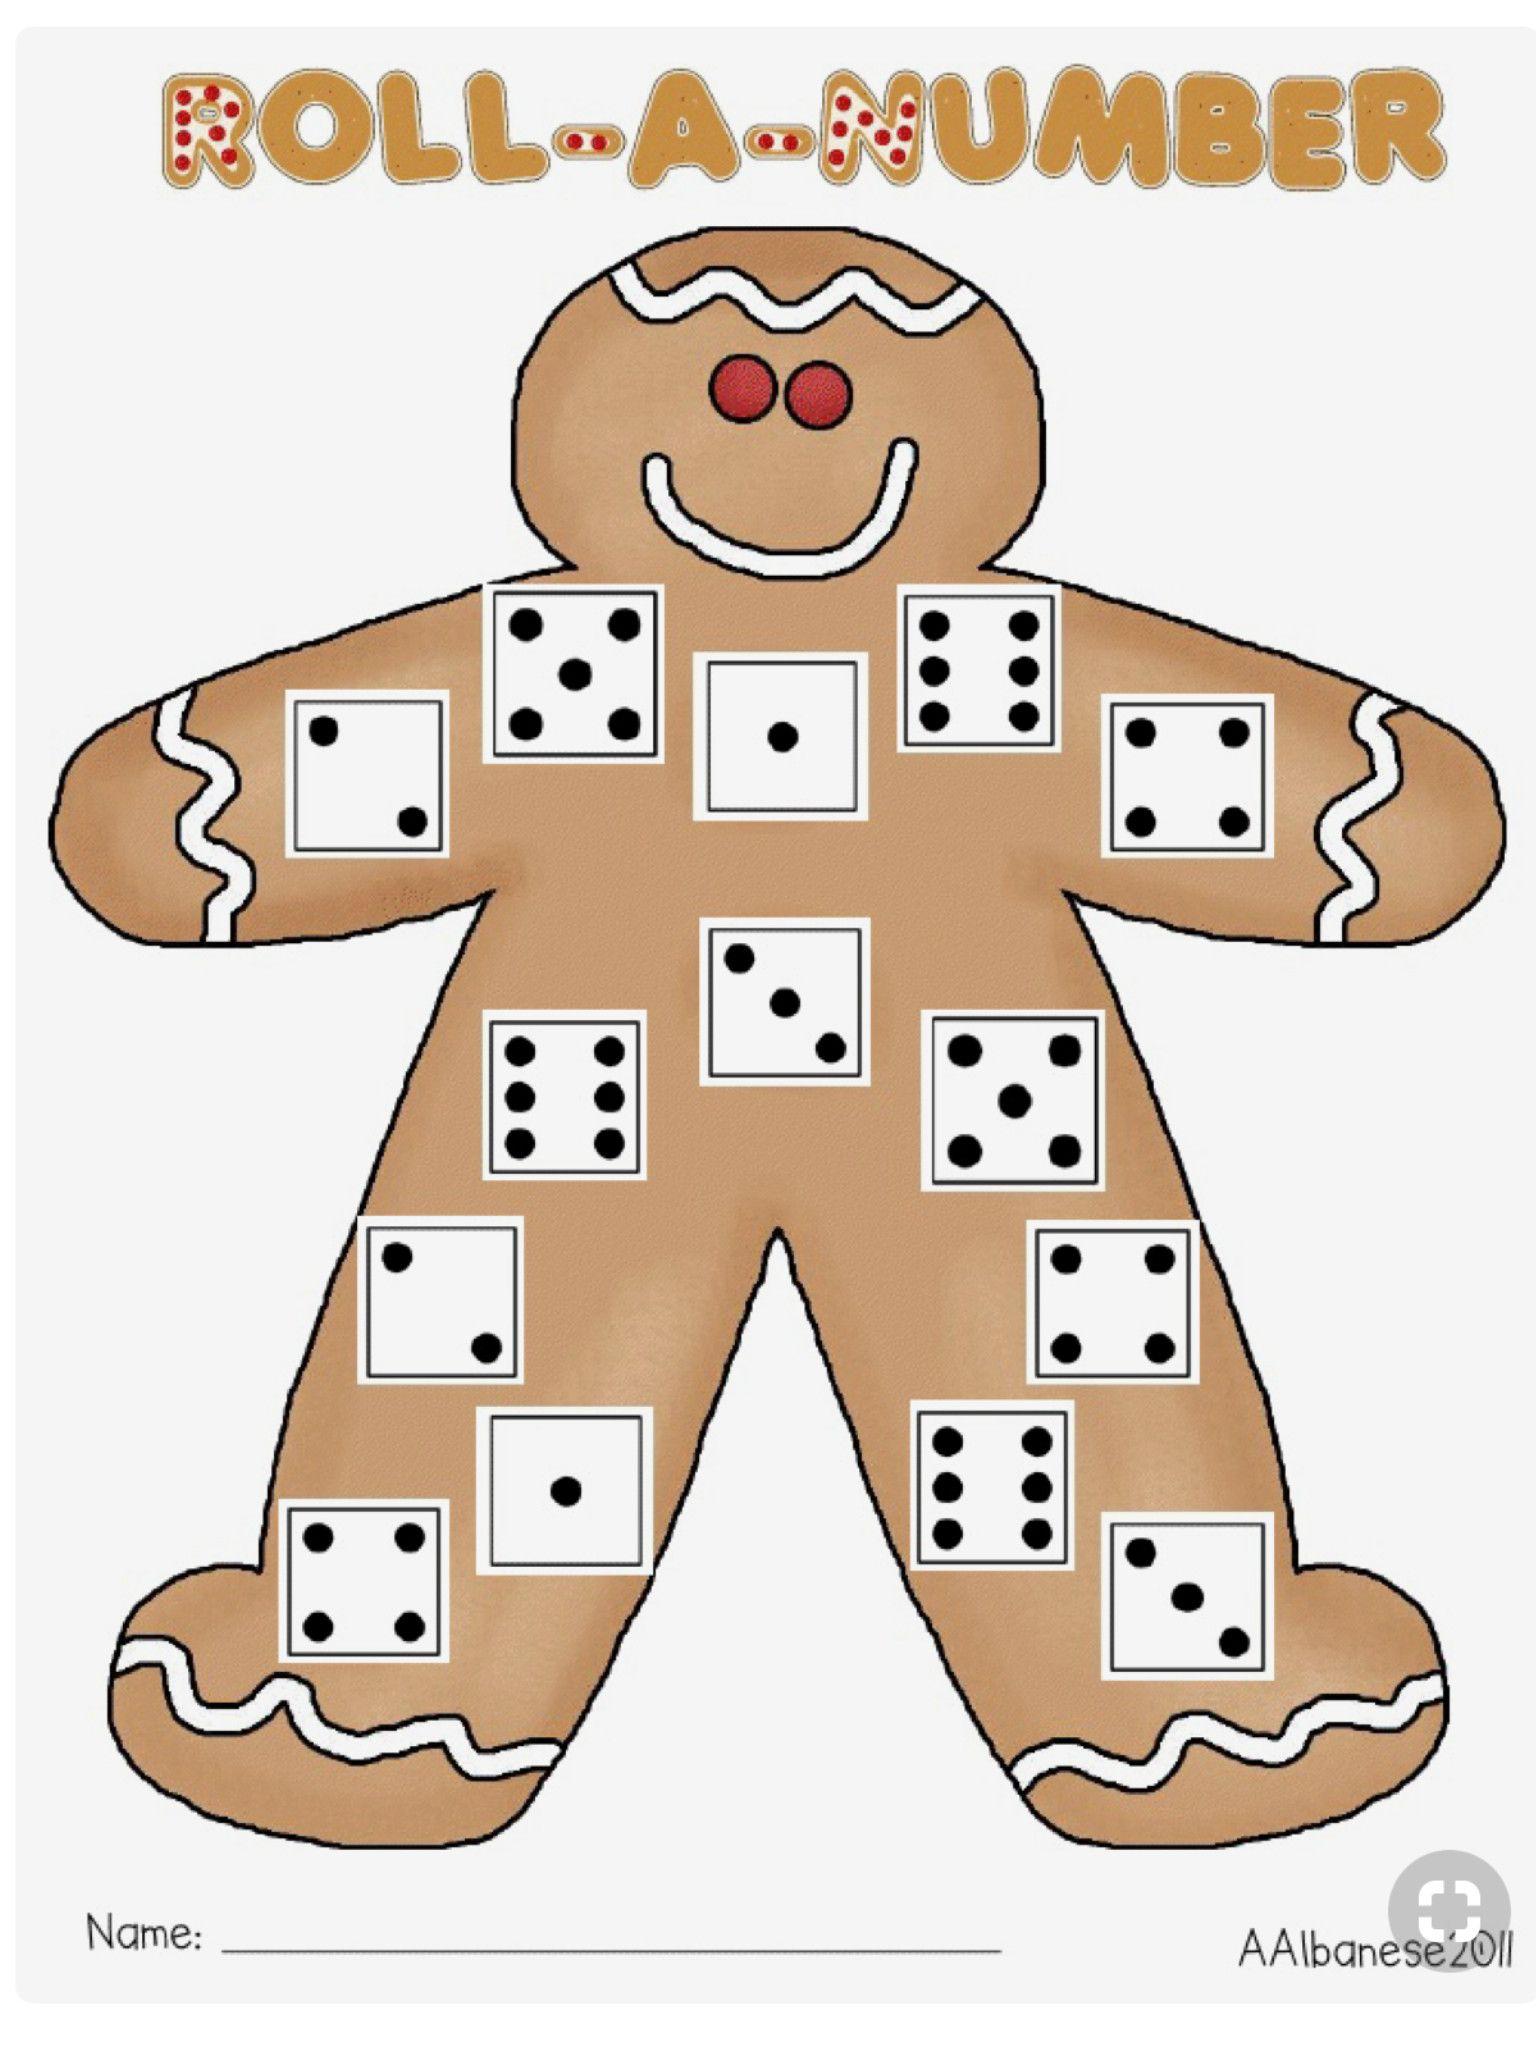 5 Gingerbread Worksheets For Preschool In